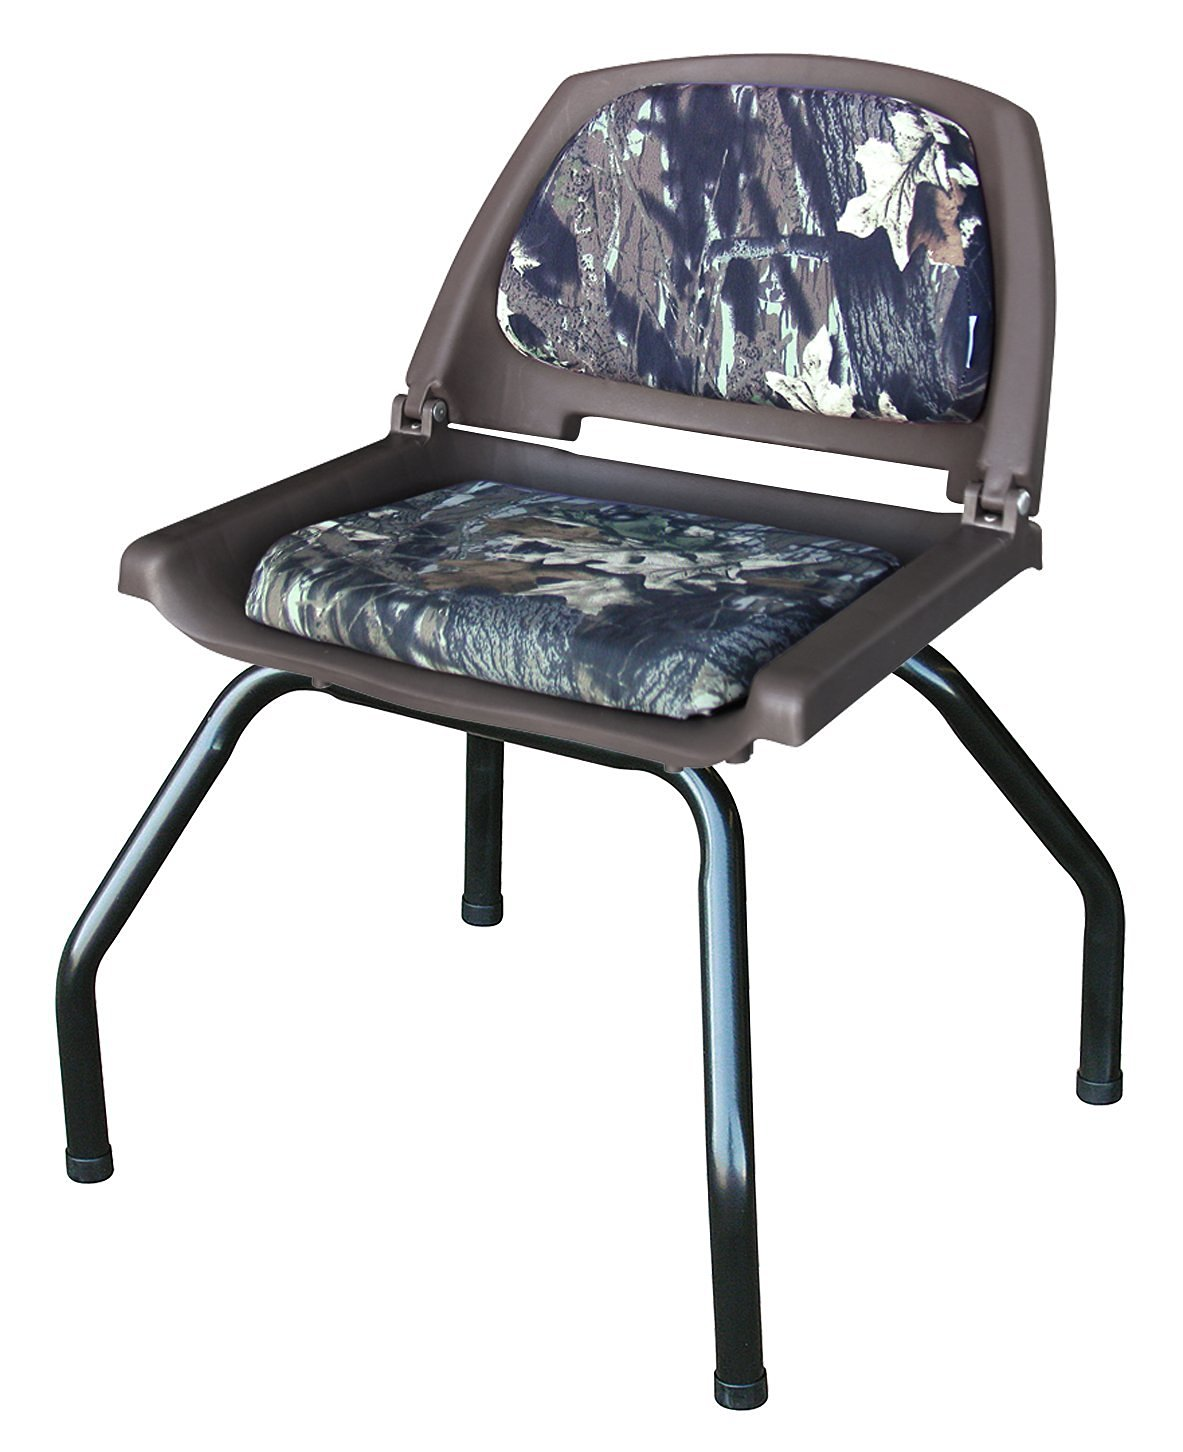 Admirable Buy Wise Outdoors 8Wd302 763 Hunting Blind Seat Combo With Inzonedesignstudio Interior Chair Design Inzonedesignstudiocom